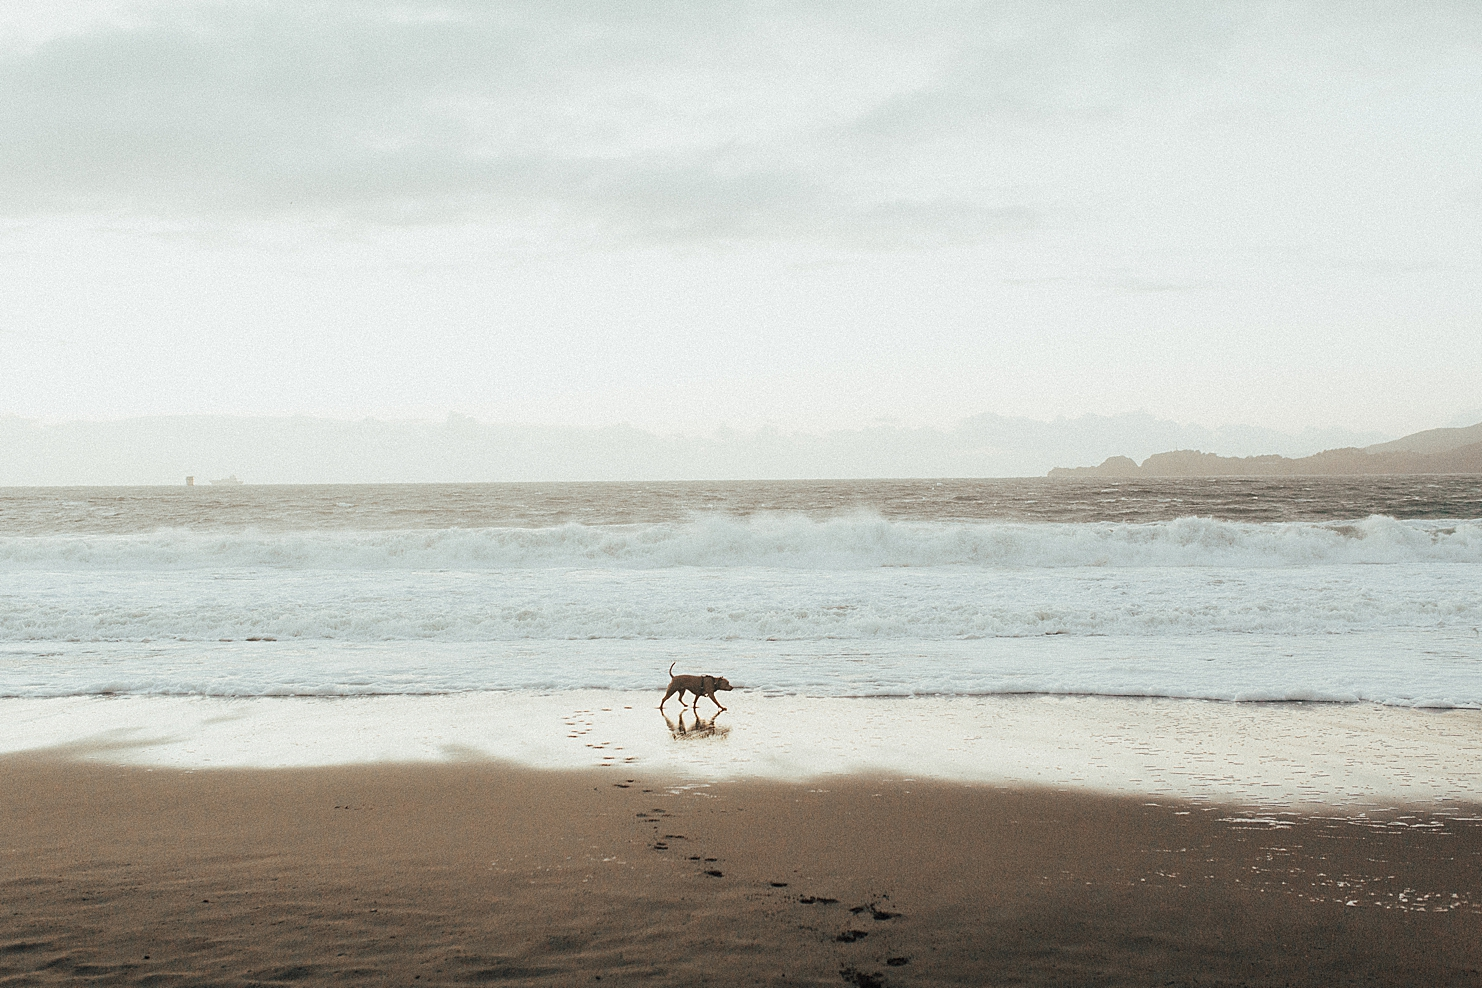 SanFranciscoEngagementPhotographyRachelWakefieldAlexaandJonathanEngagementPhotos(107of131).jpg